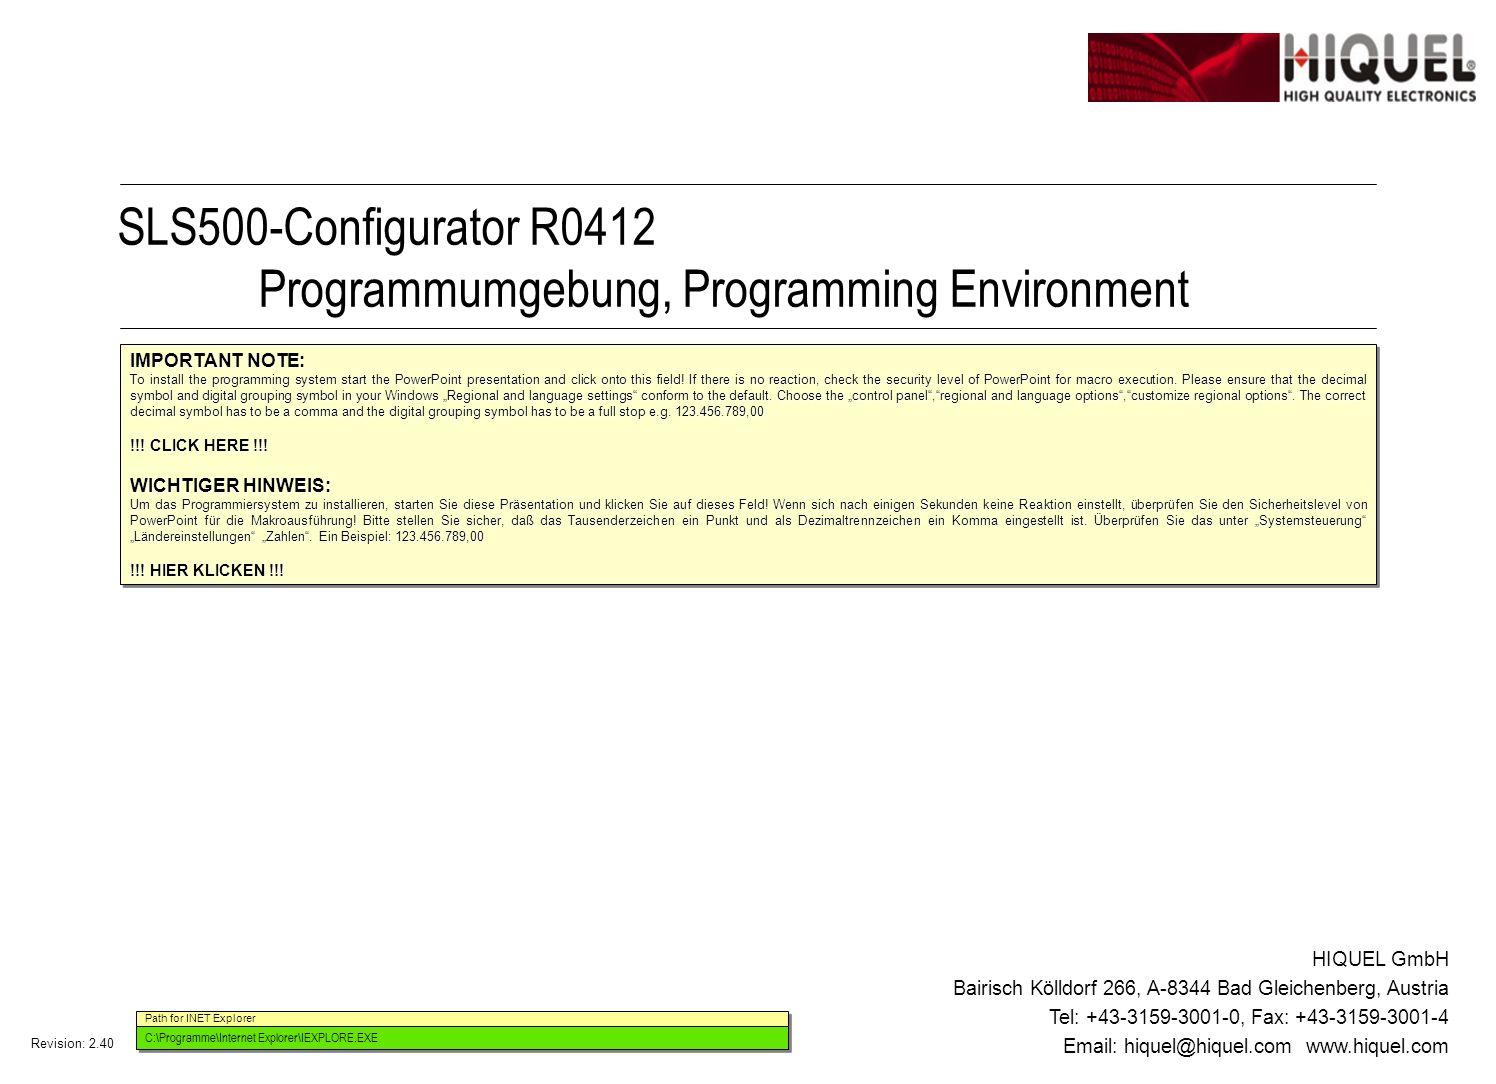 Revision: 2.40 Page 2 Title: Configuration Define your configuration here DI1: DI2: DI3: DI4: DI5: DI6: DI7: DI8: DO1: DO2: DO3: DO4: DO5: DO6: AI1: AI2: AI3: AI4: POTI1: POTI2: SLS500-R